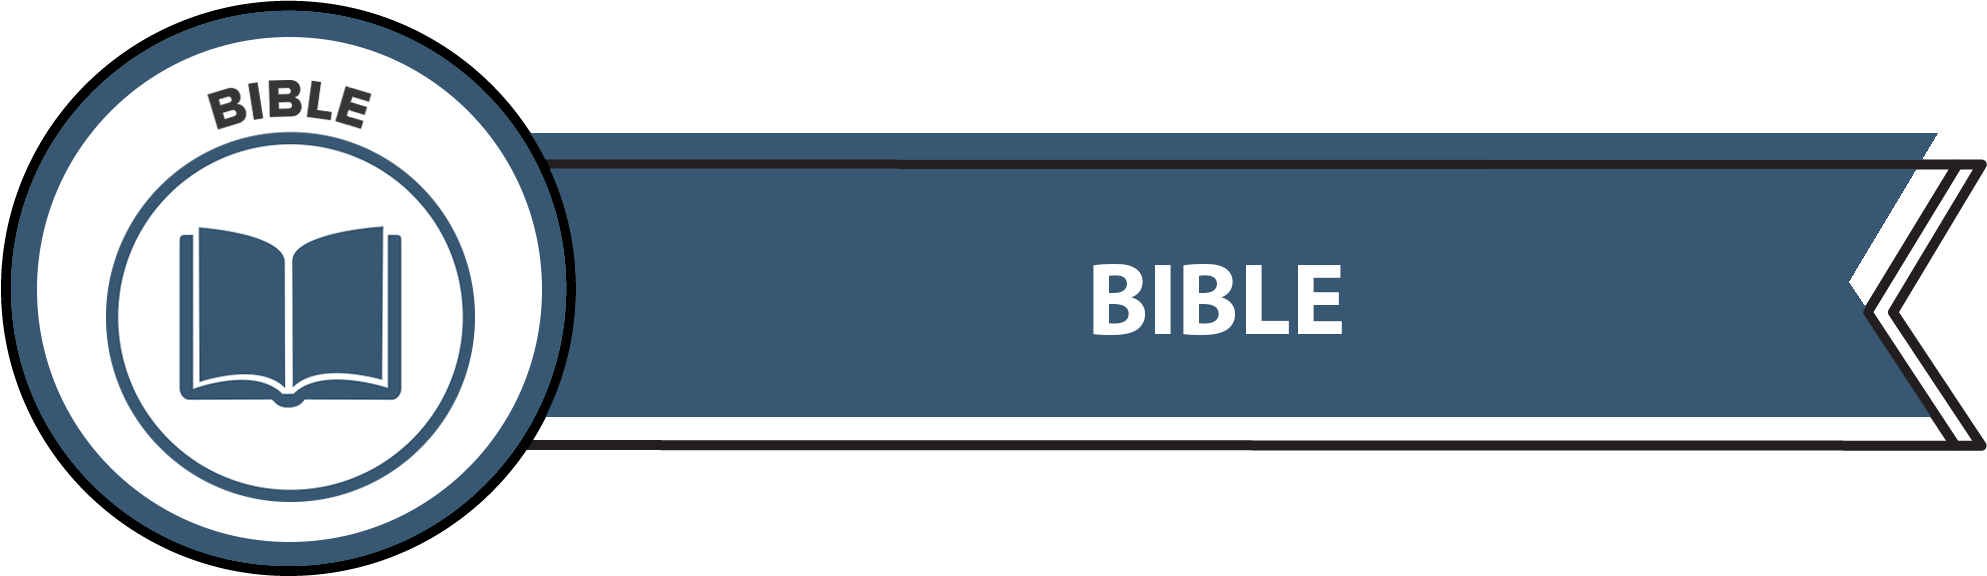 Bible Concept